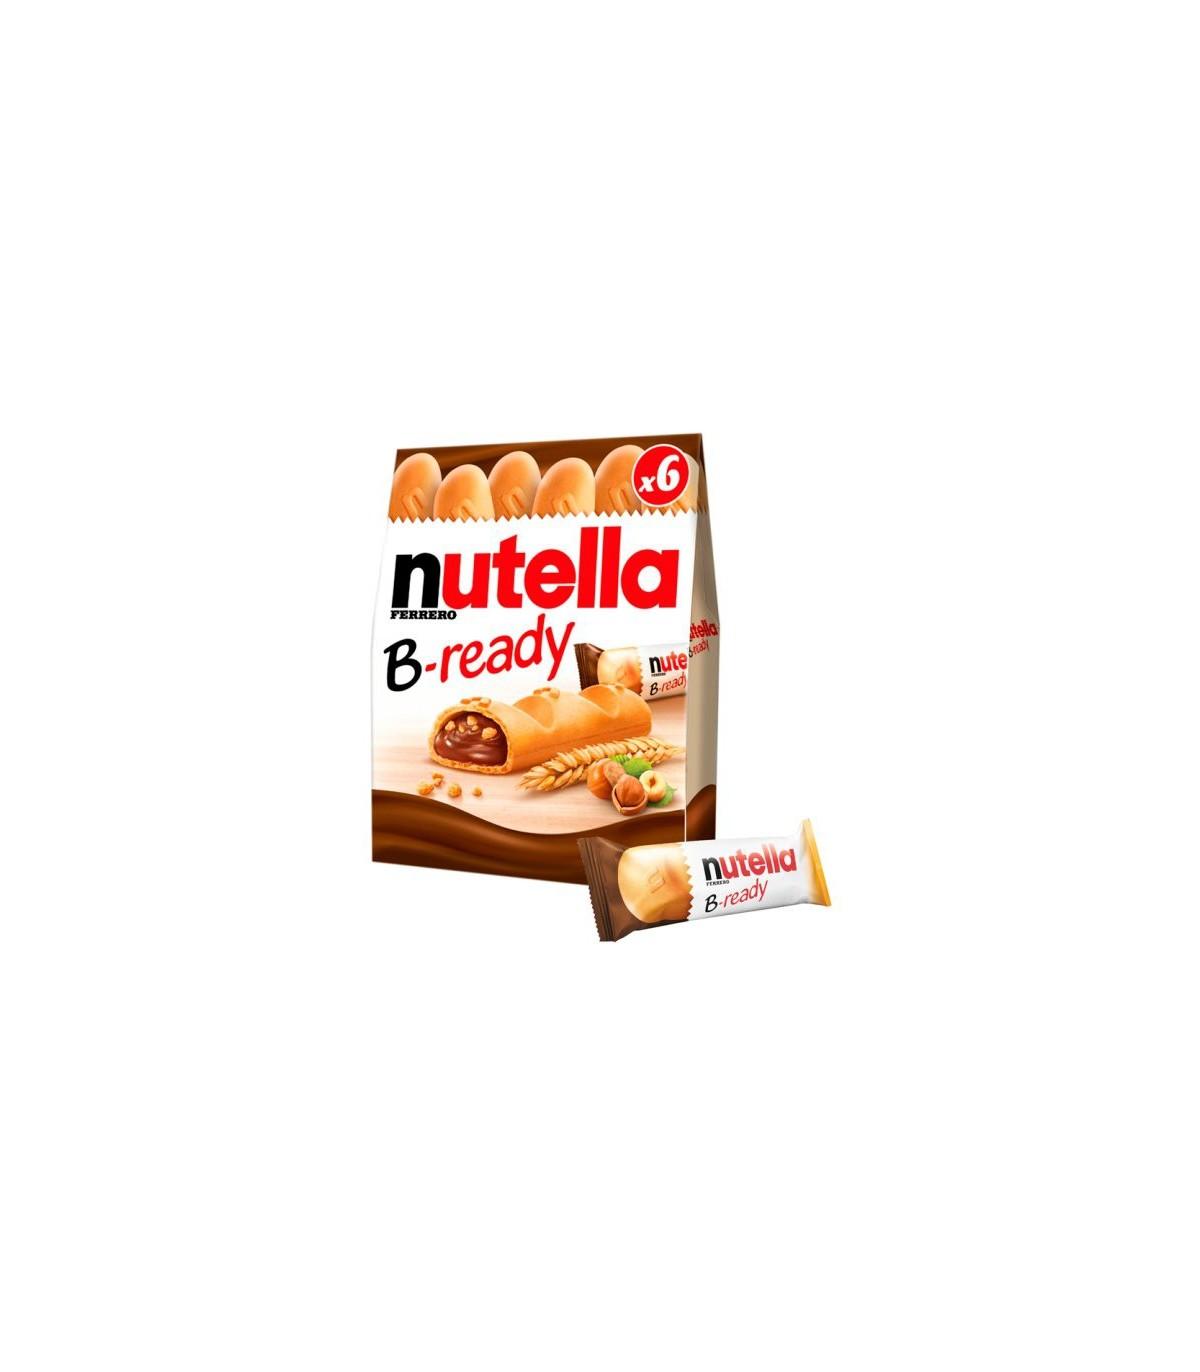 Nutella بیسکويیت 6 عددی بی ردی نوتلا